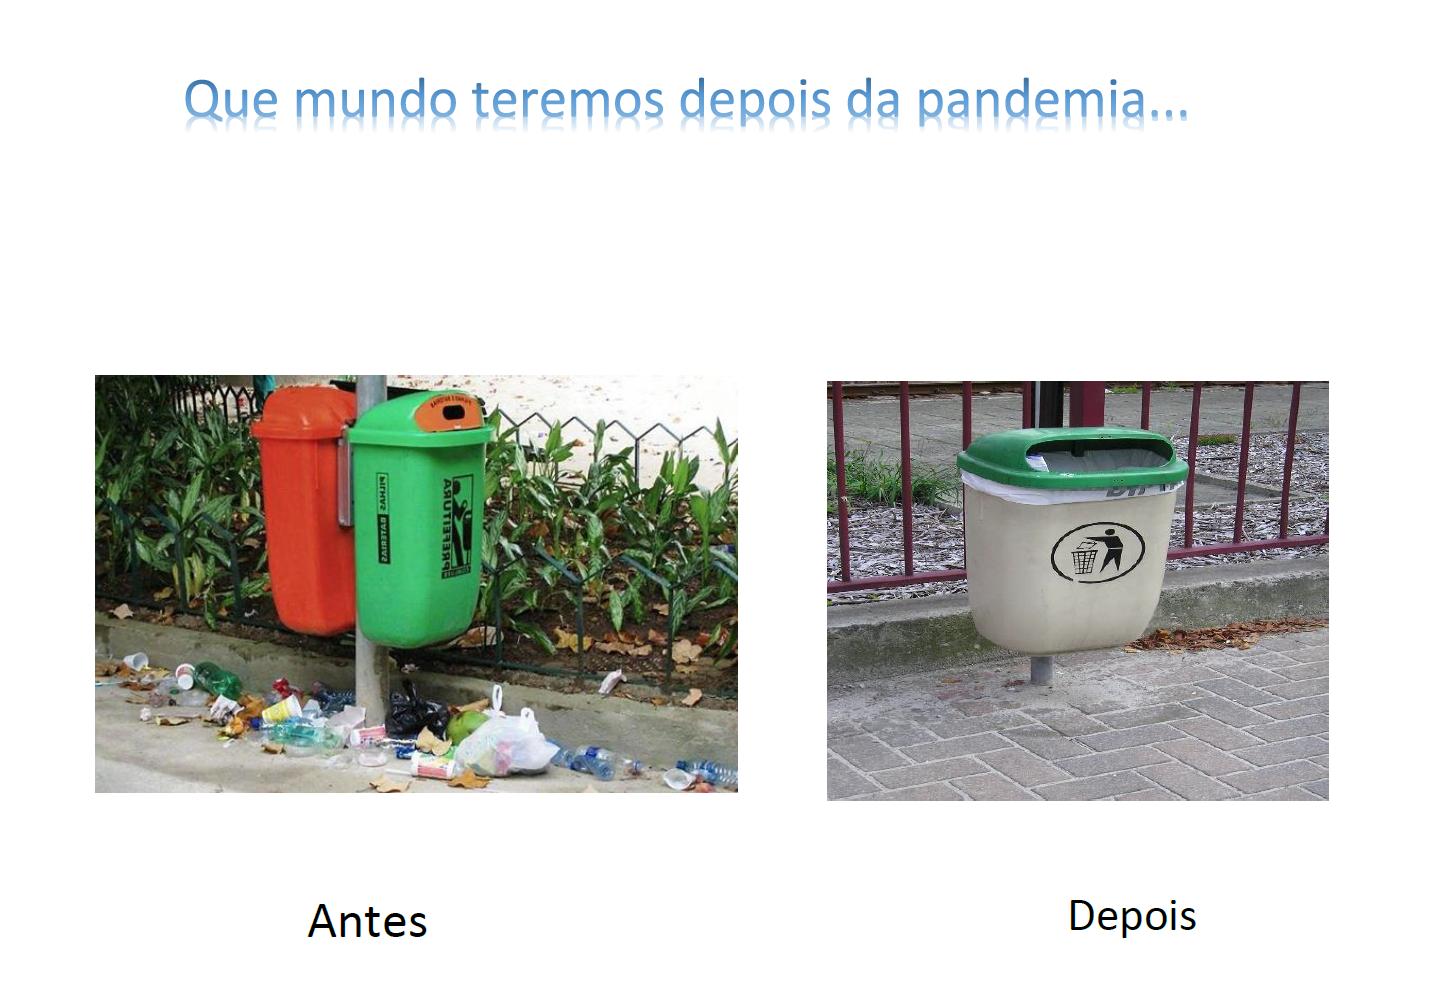 Adriana Ferreira, EB 2/3 S Pedro Ferreiro, Ferreira do Zêzere